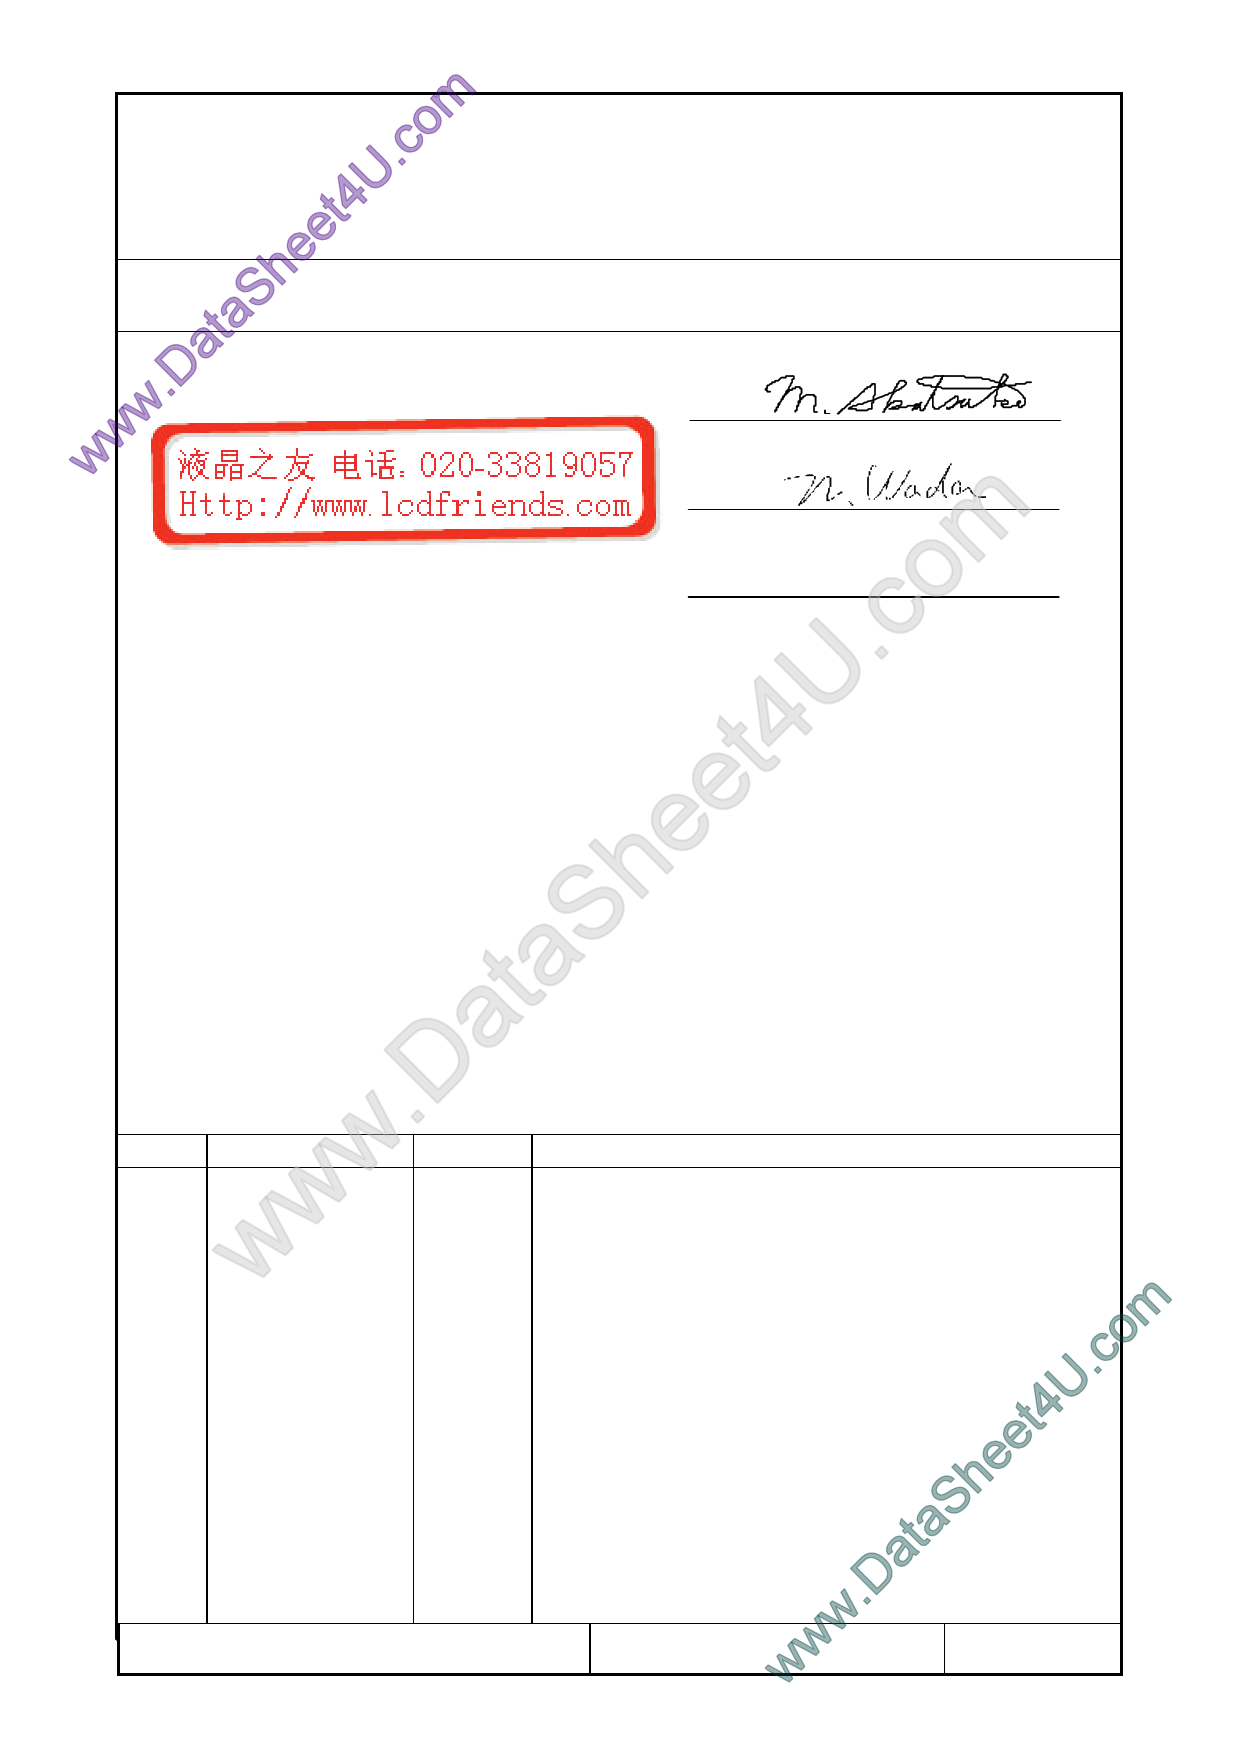 F-51852GNFJ-SLW-AEN Даташит, Описание, Даташиты